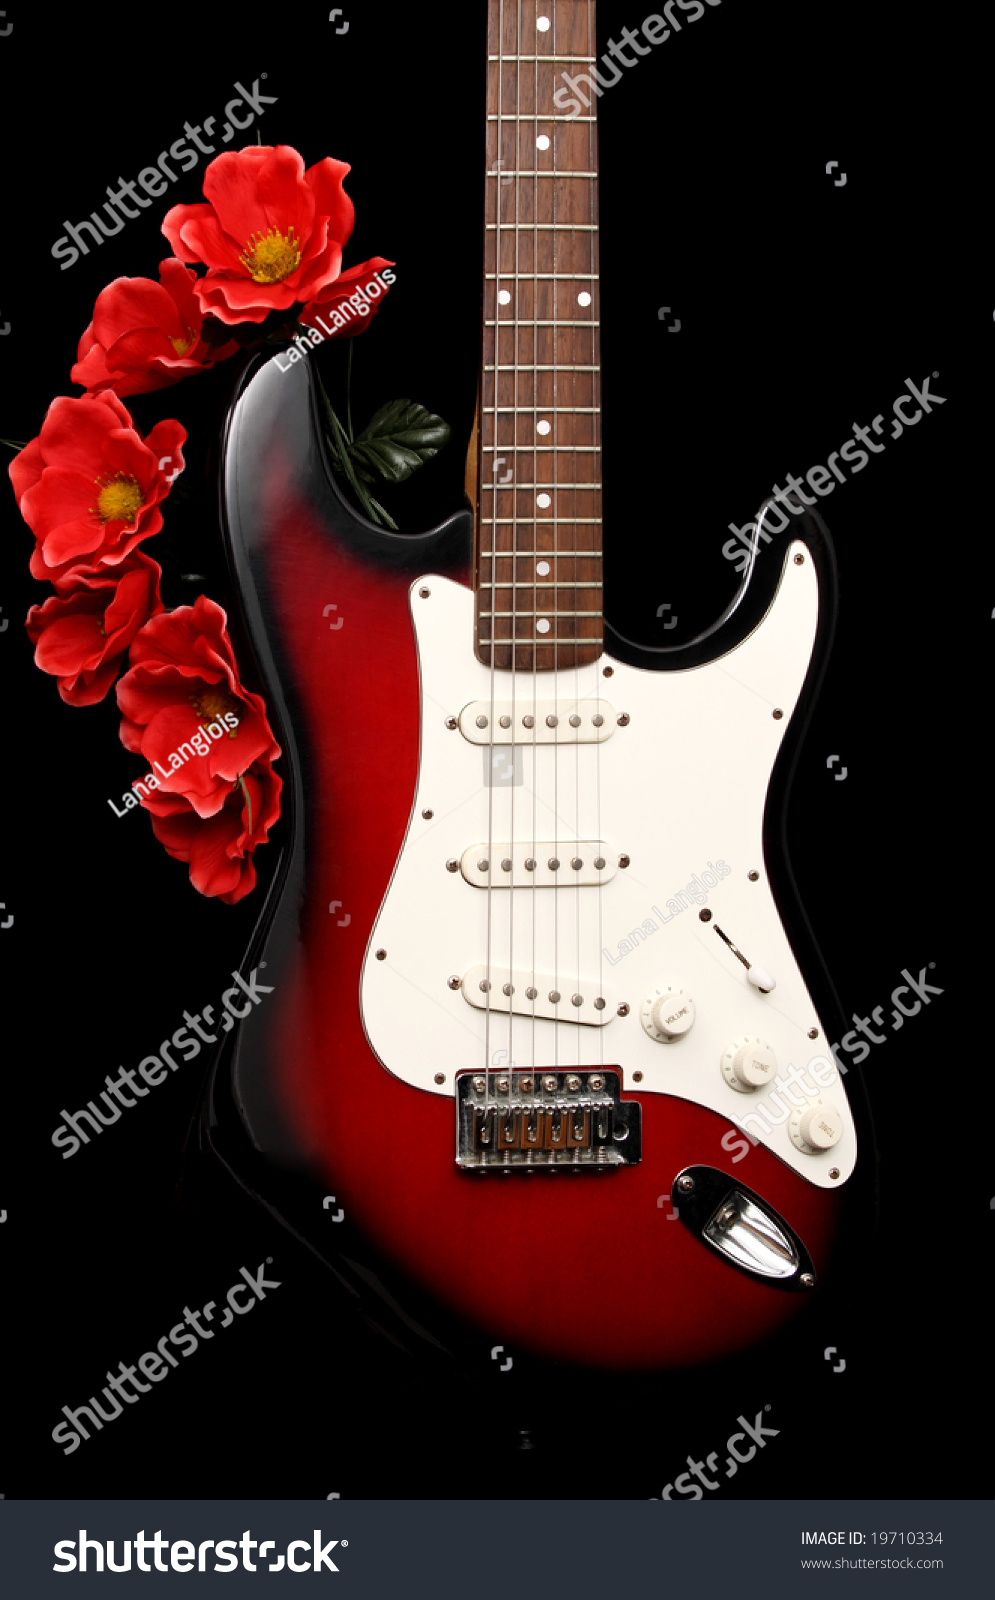 electric guitar fake red flowers black stock photo 19710334 shutterstock. Black Bedroom Furniture Sets. Home Design Ideas